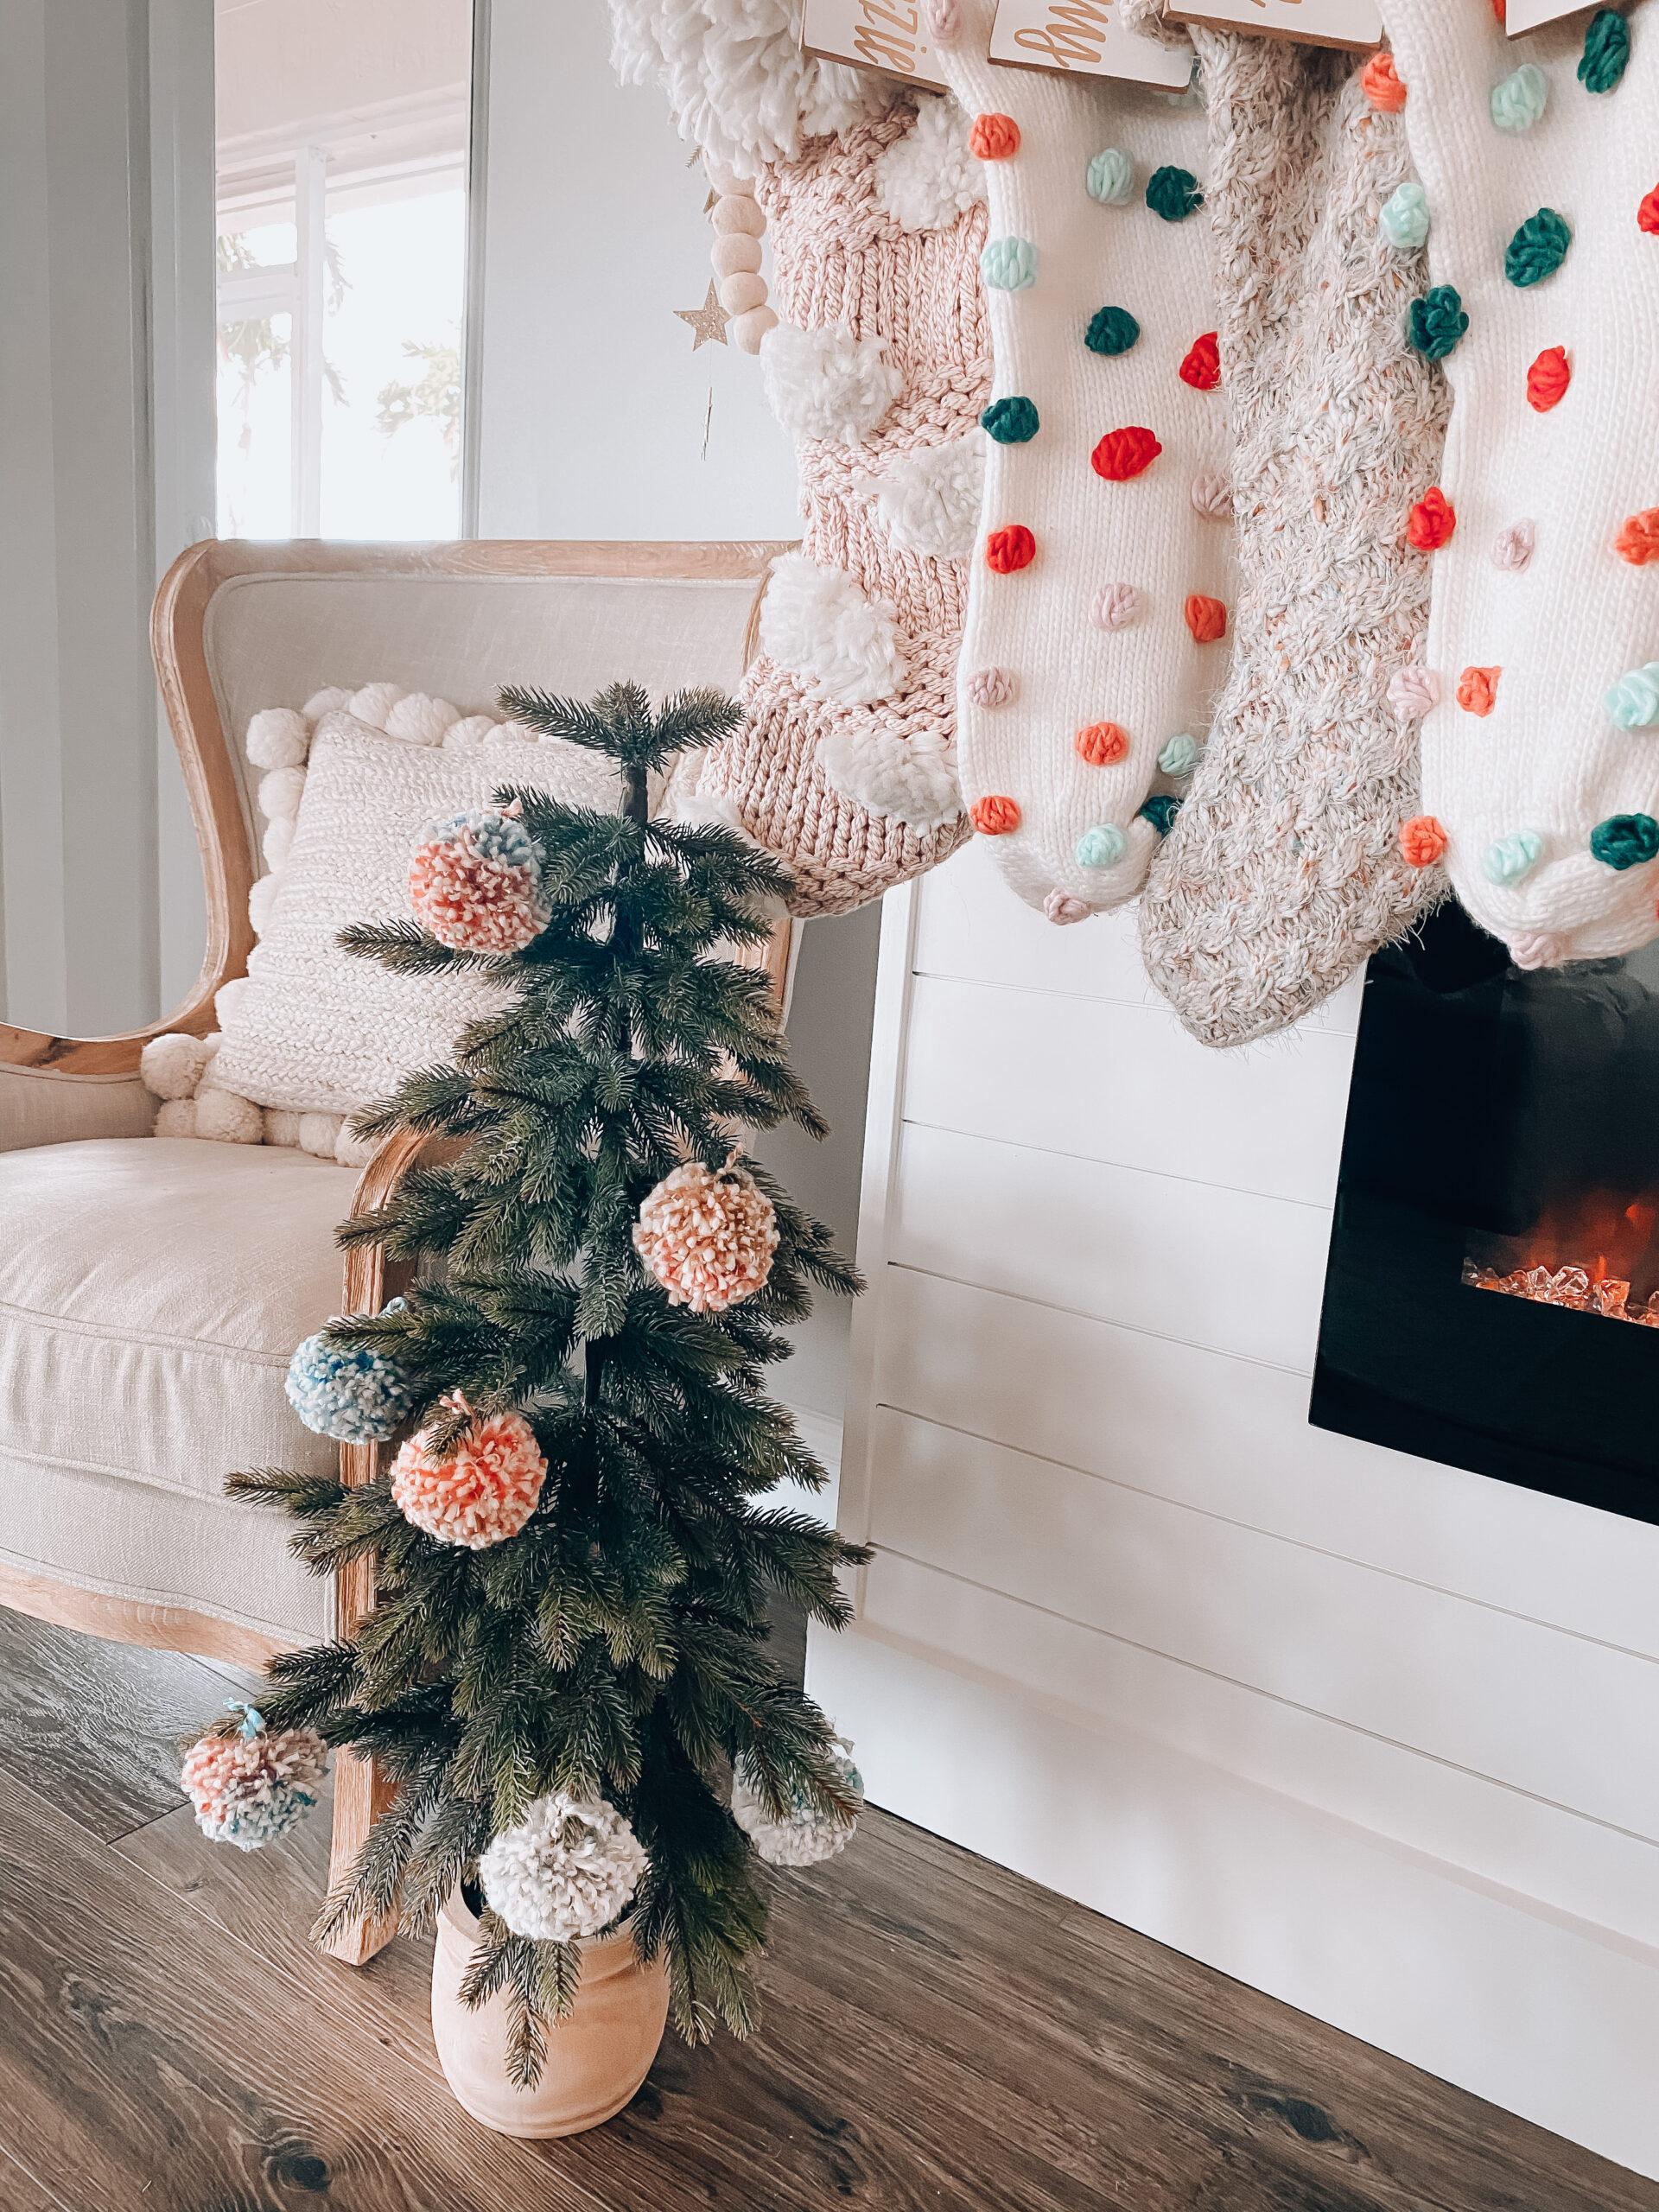 Mini Christmas tree with pom pom ornaments